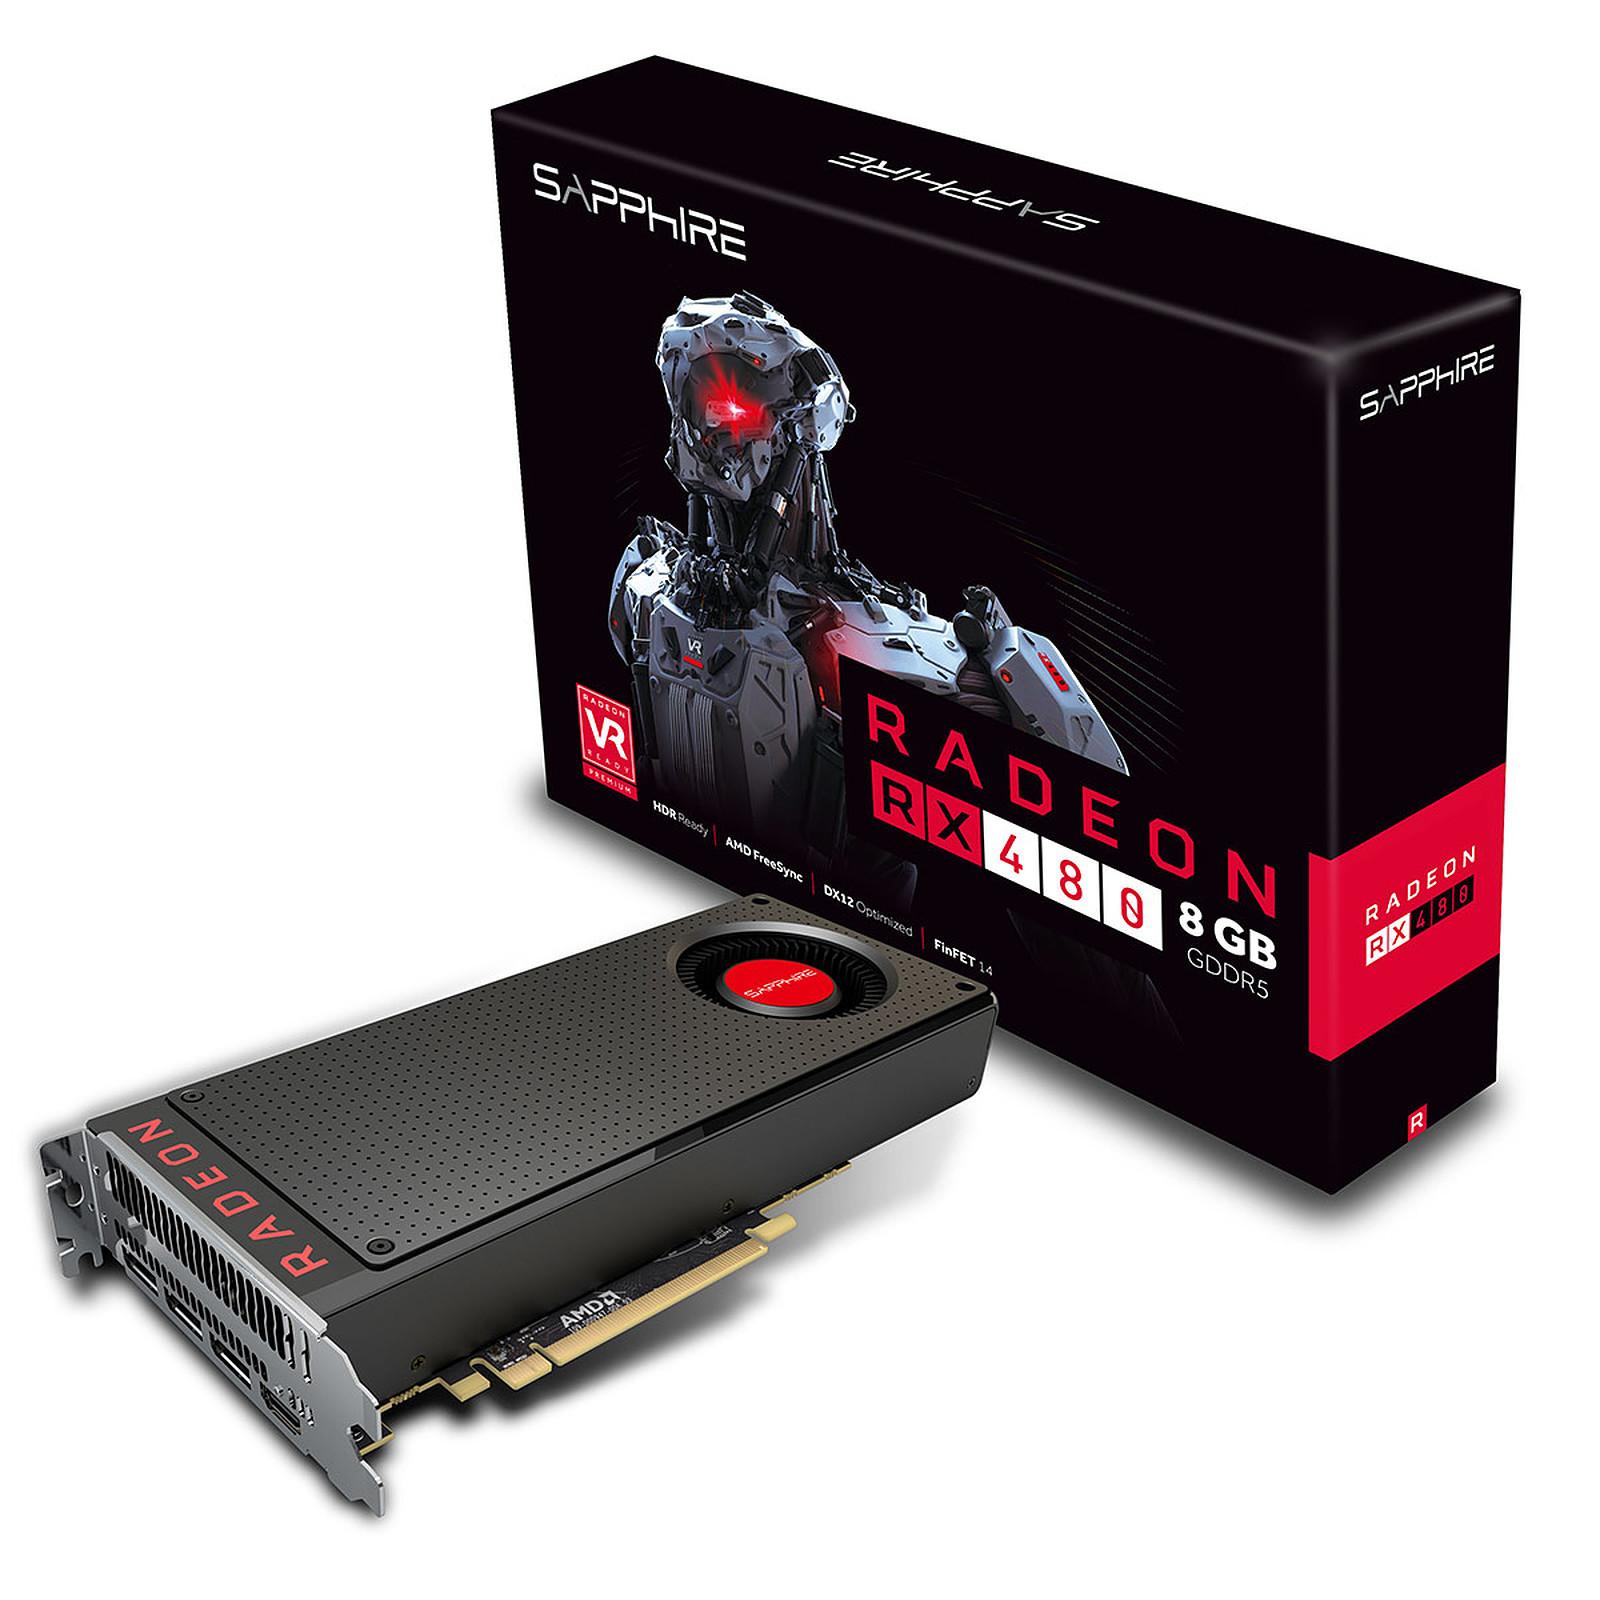 Sapphire Radeon RX 480 8GD5